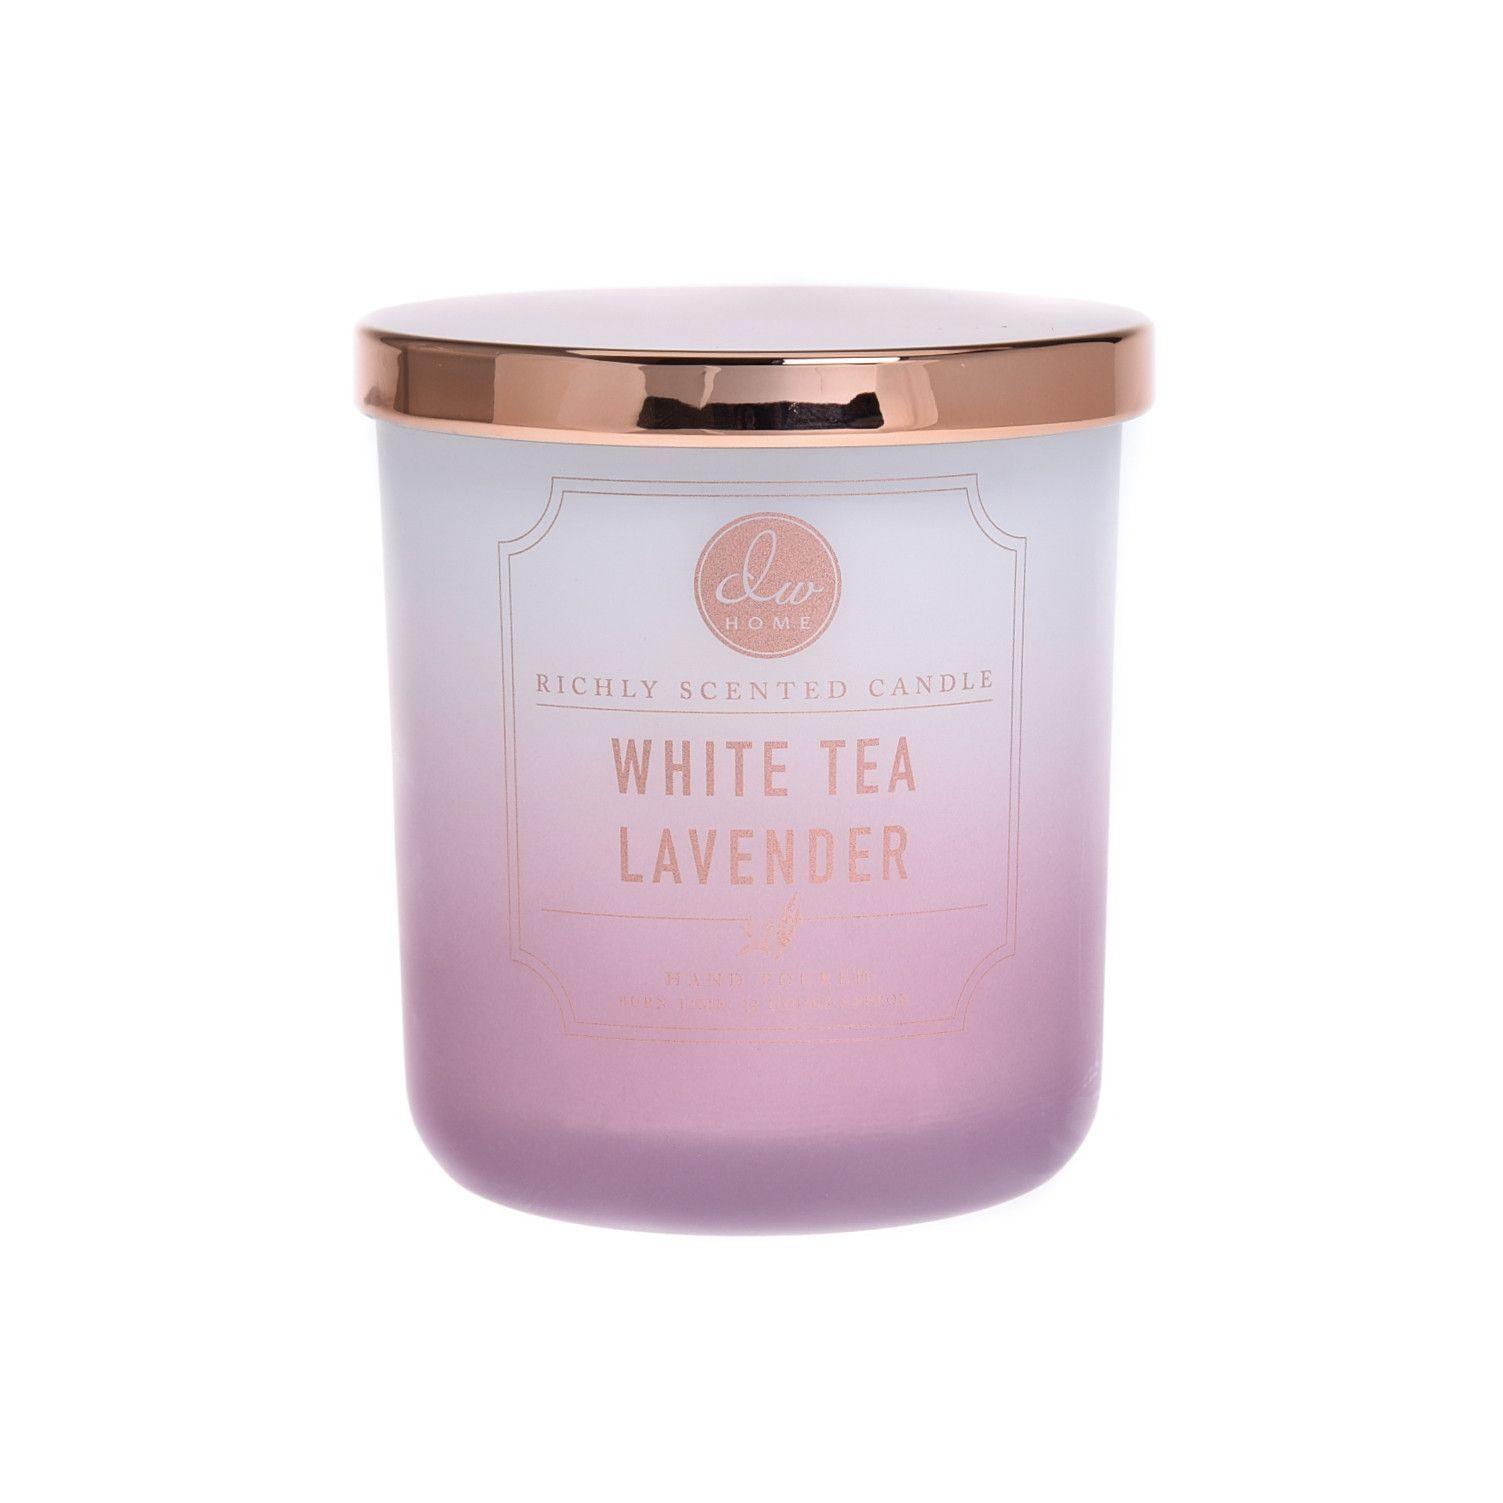 White Tea Lavender Dw Home Scented Candles Dw7112 Dw7119 Dw7126